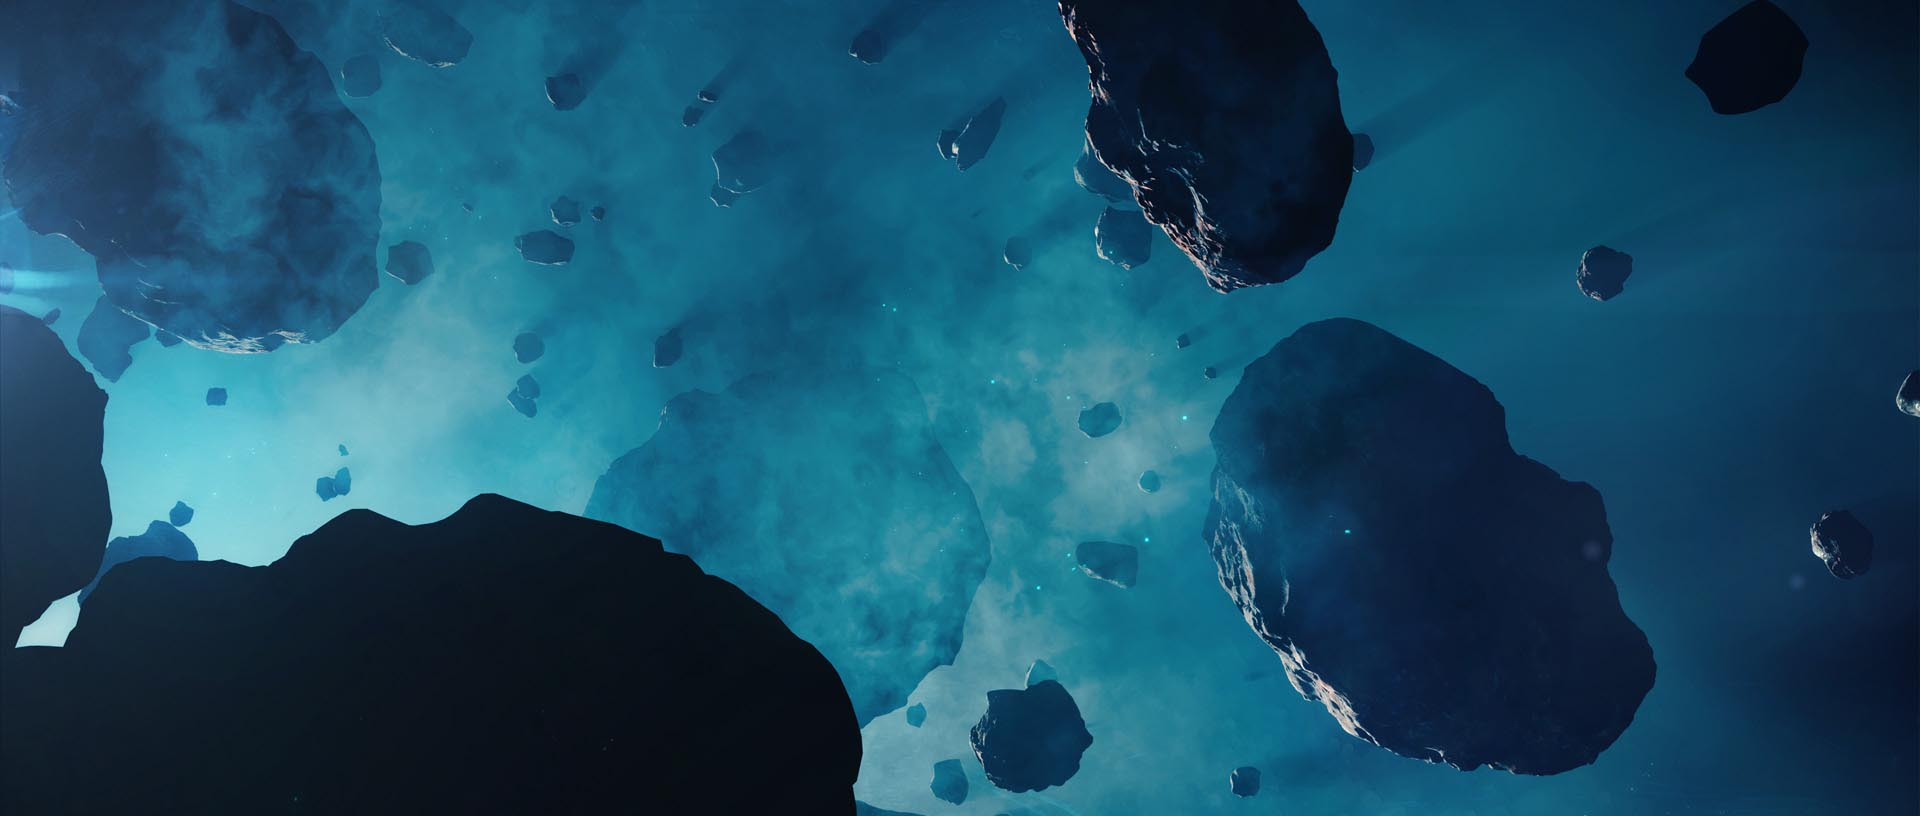 asteroids tutorial blender